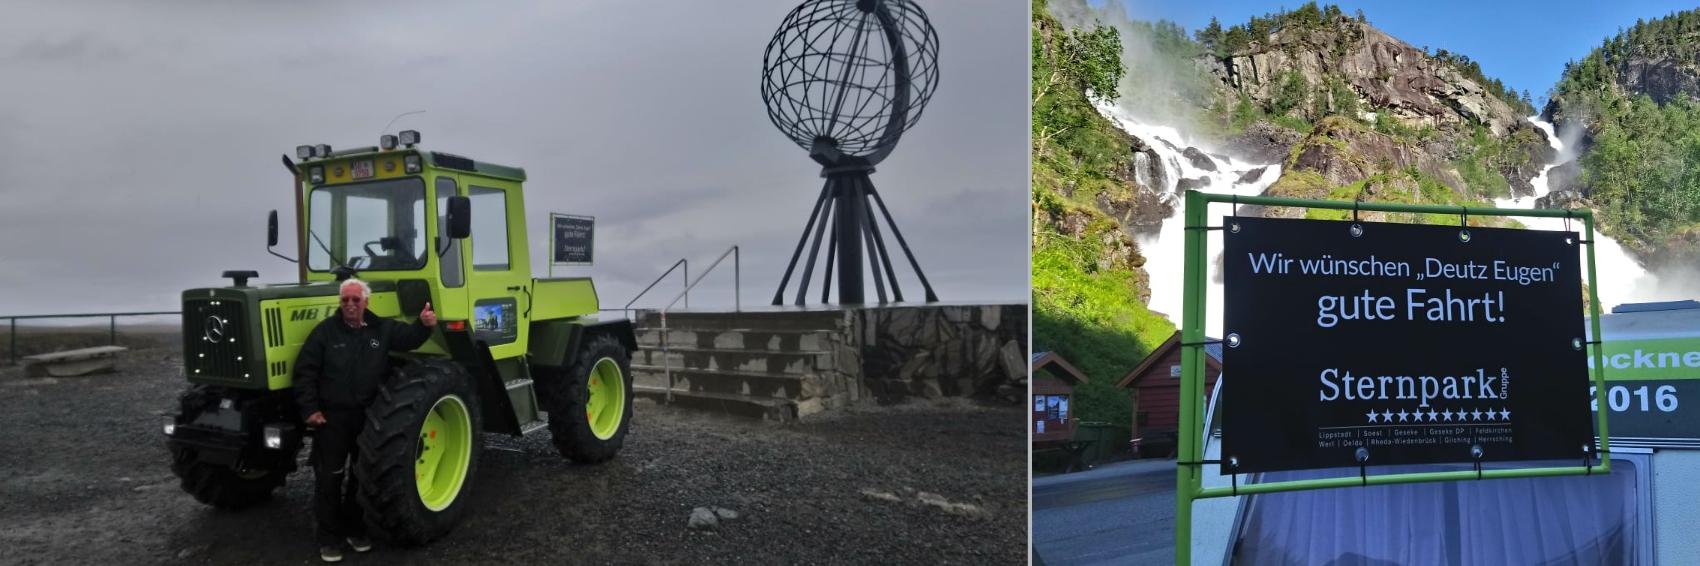 Sternpark-Kunde am Nordkap